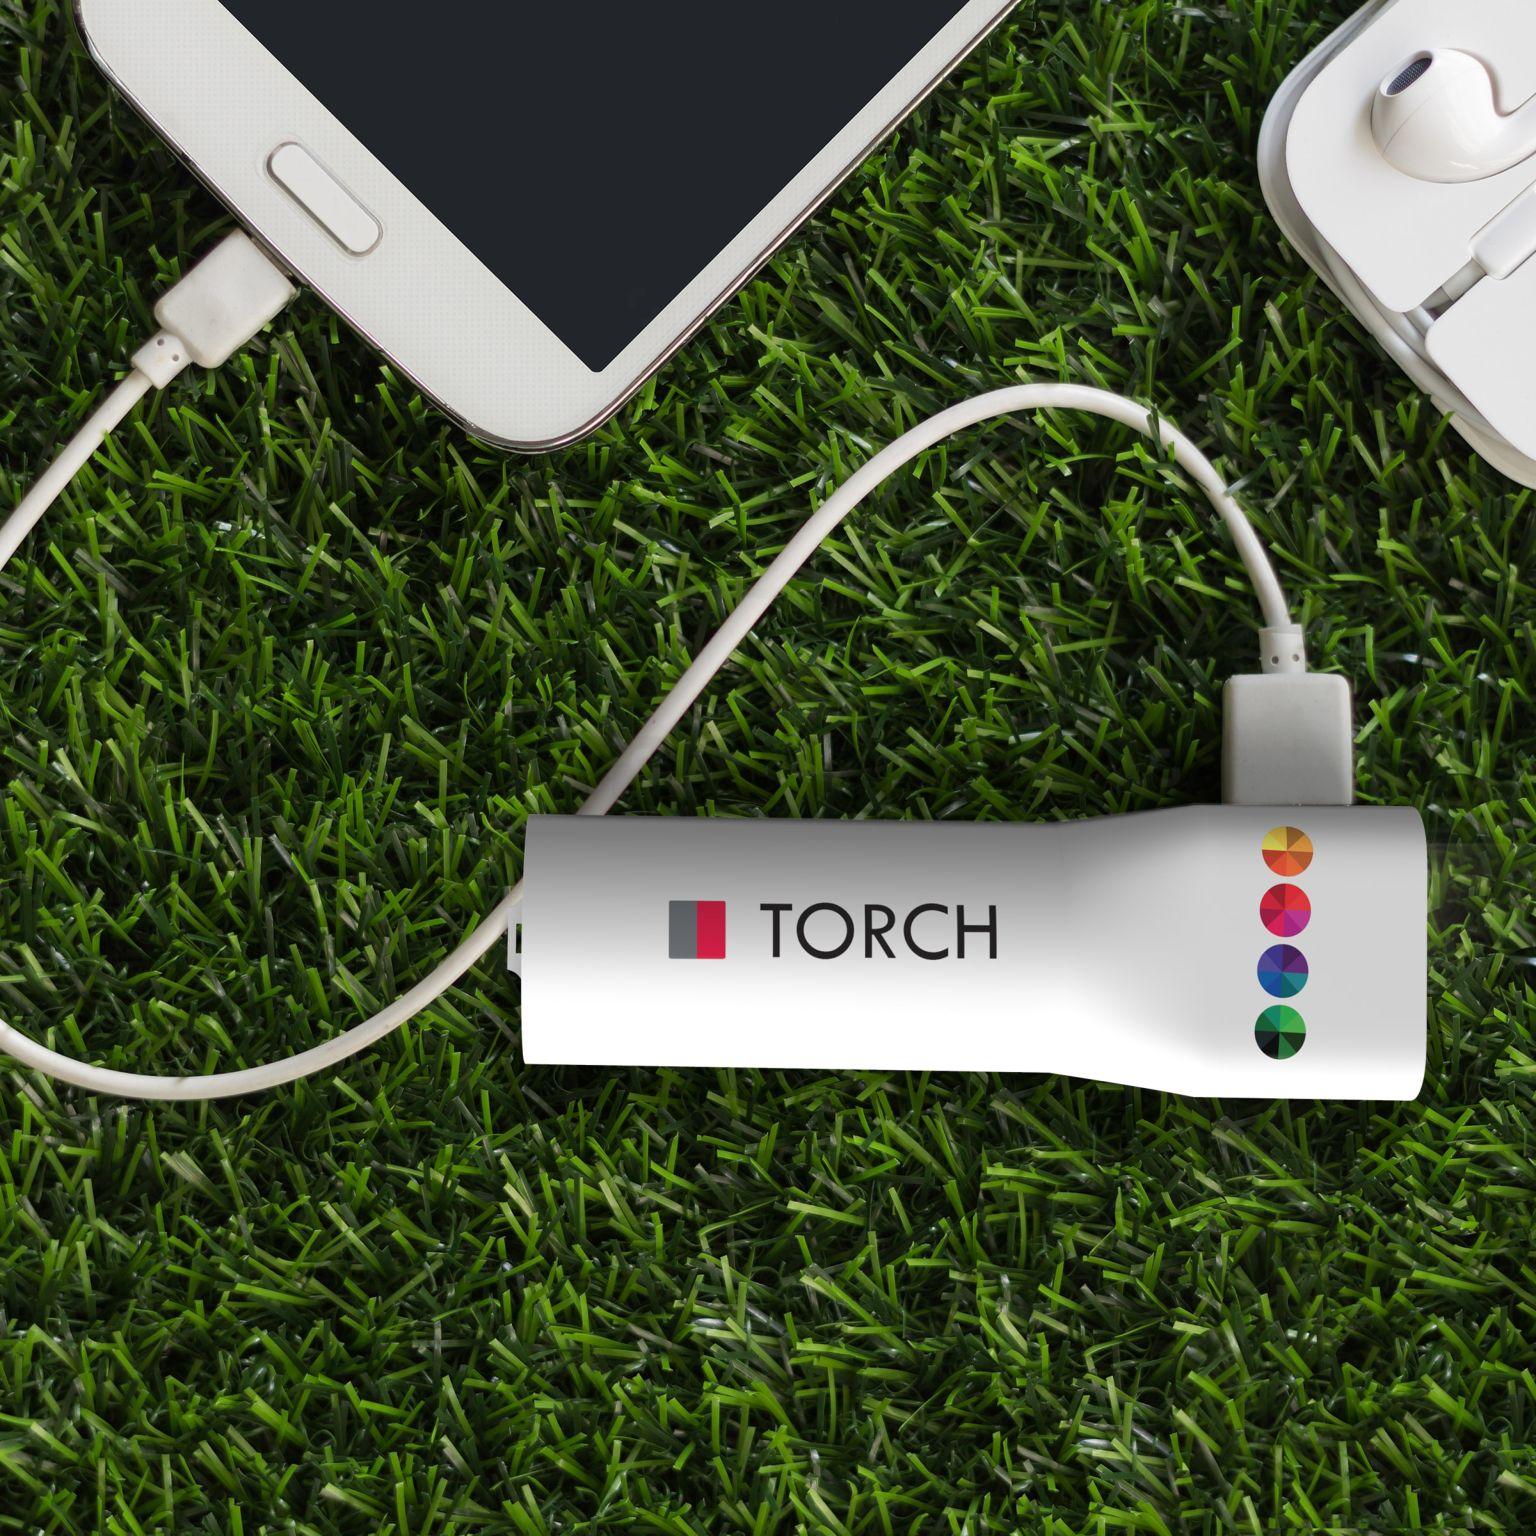 Powerbank Torch 2200 mAh Blanc avec impression quadri